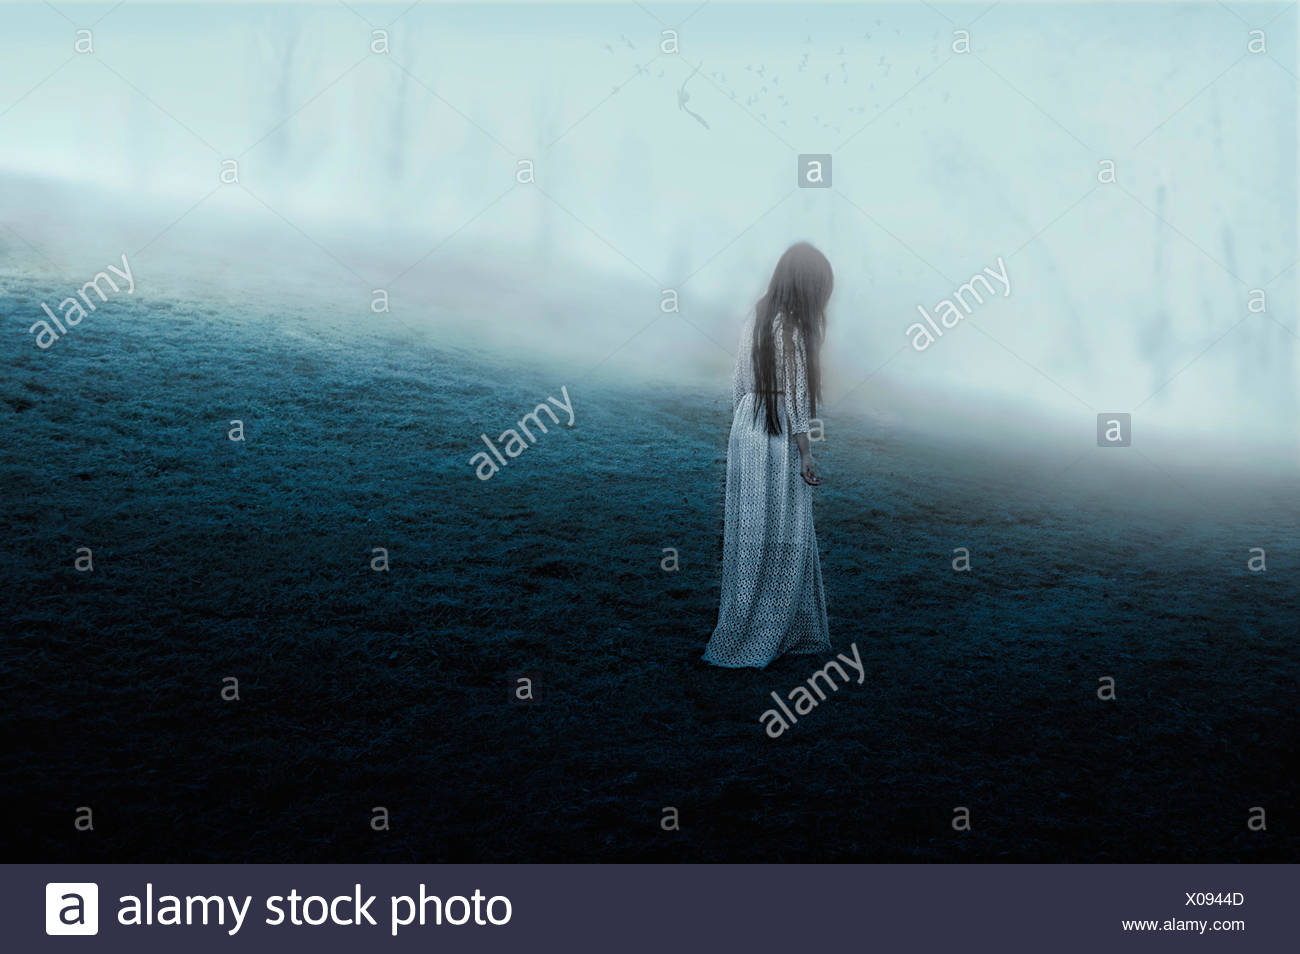 Woman walking on misty hill - Stock Image